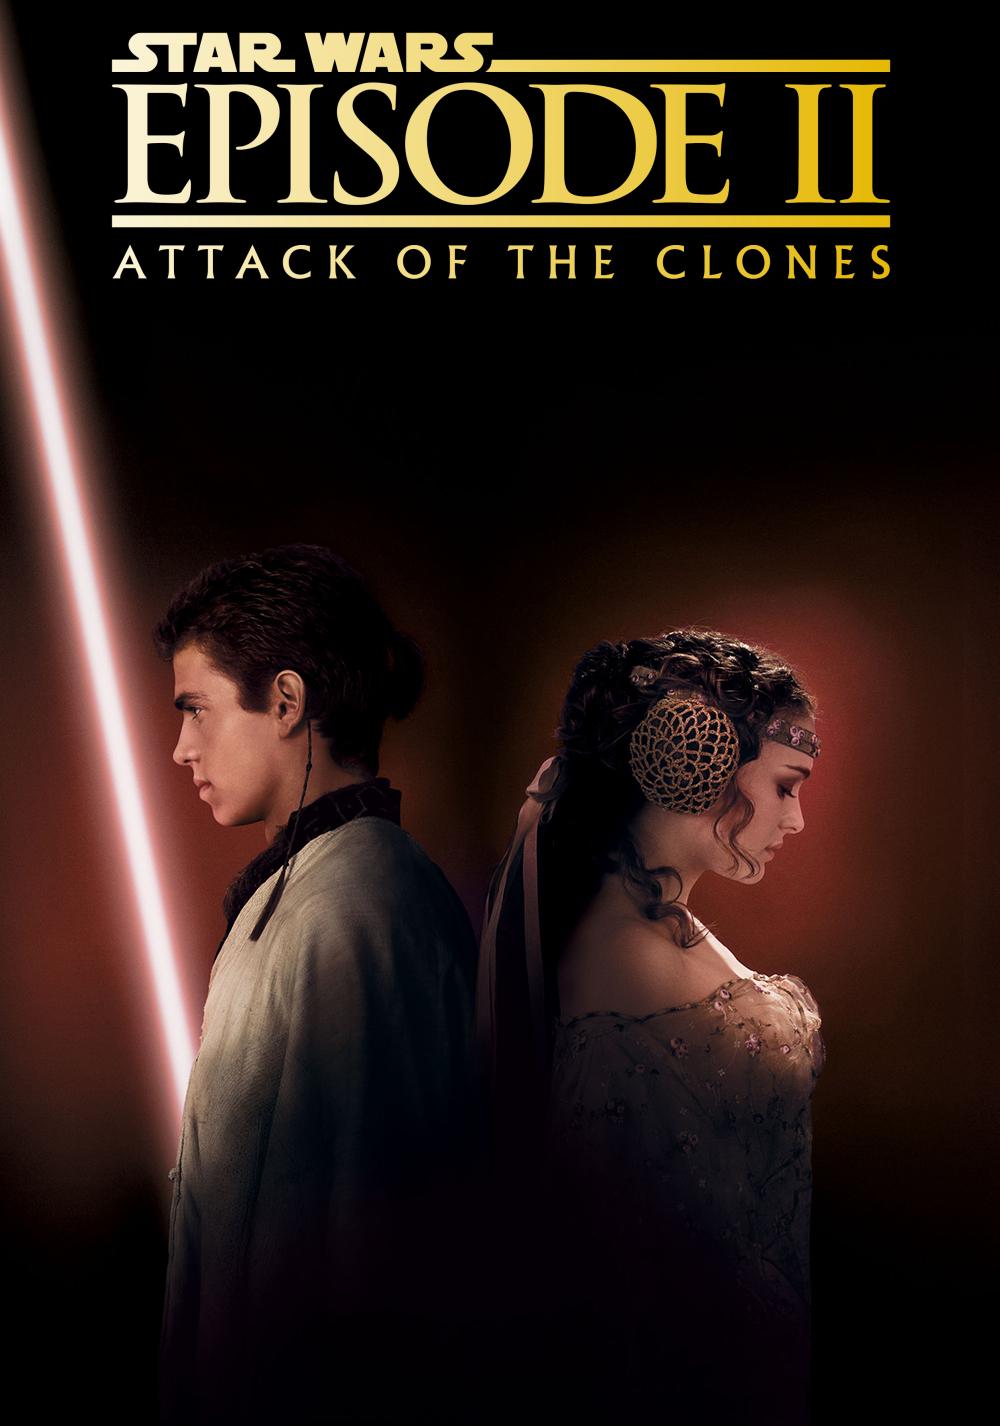 Star Wars: Episode II: Attack of the Clones - Wikipedia